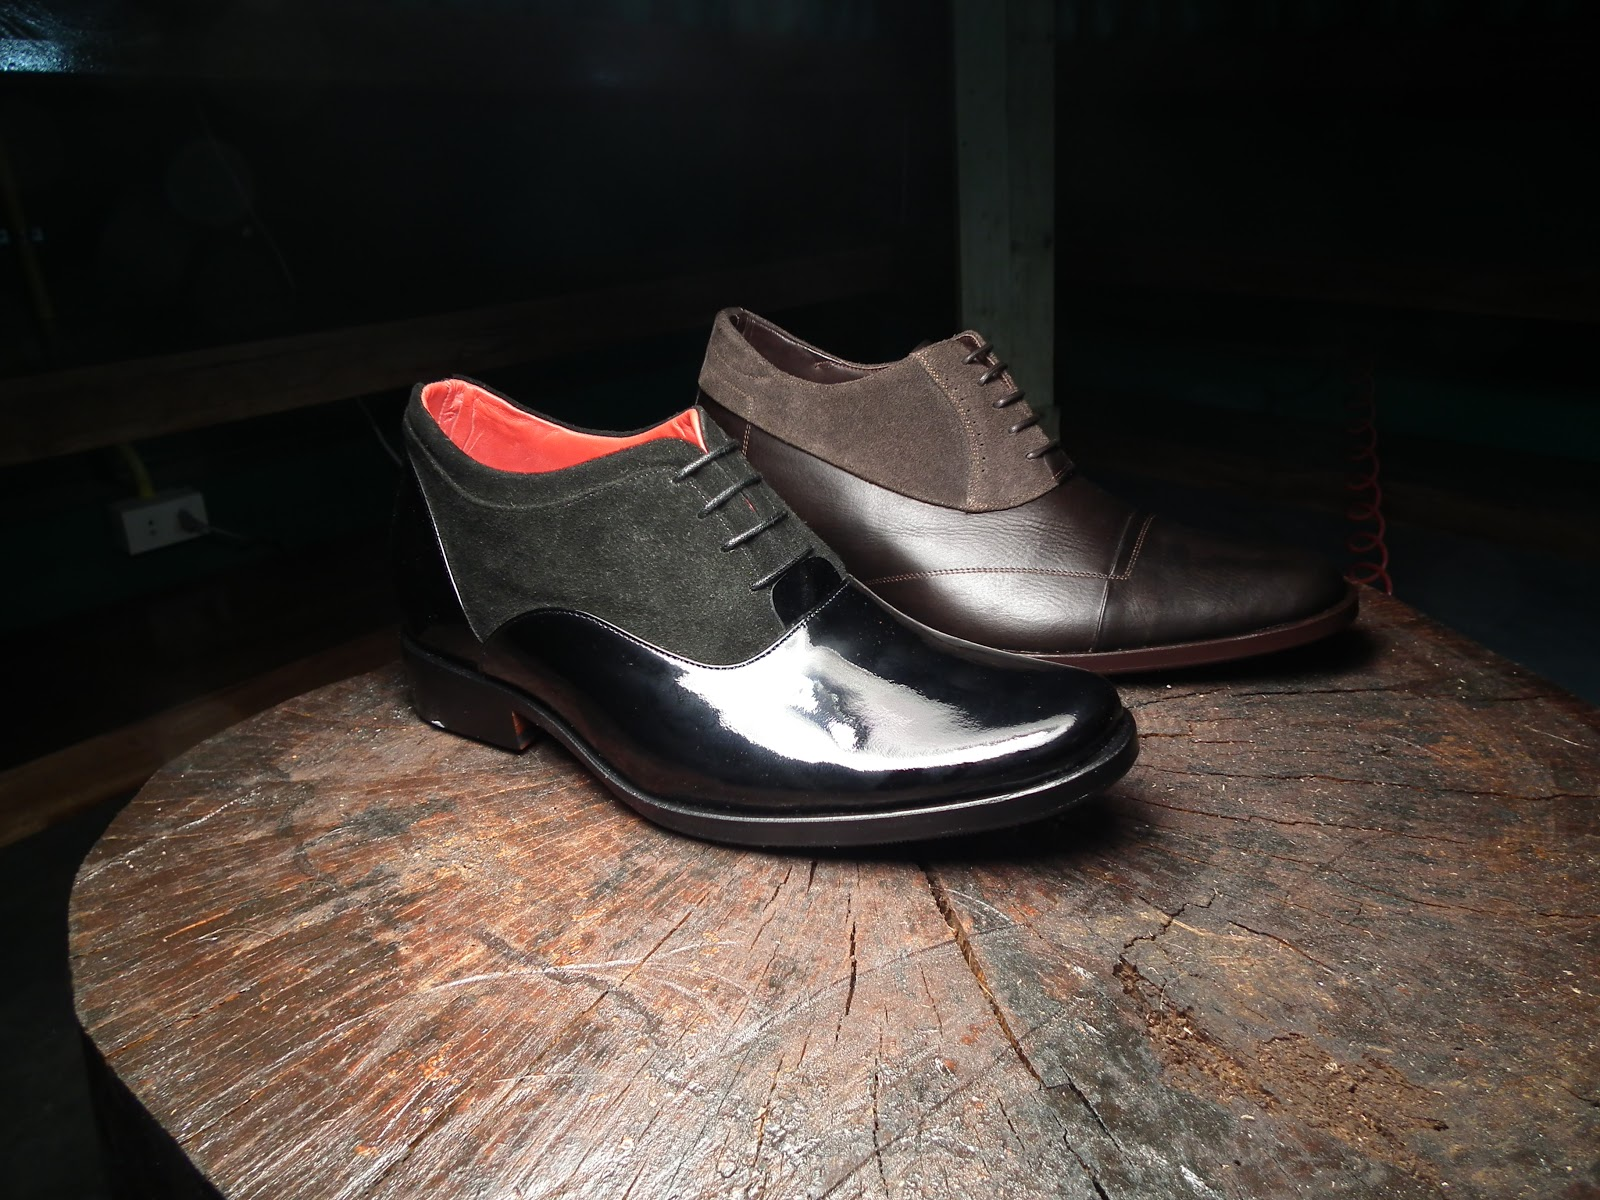 Dons Elevator Shoes Uk